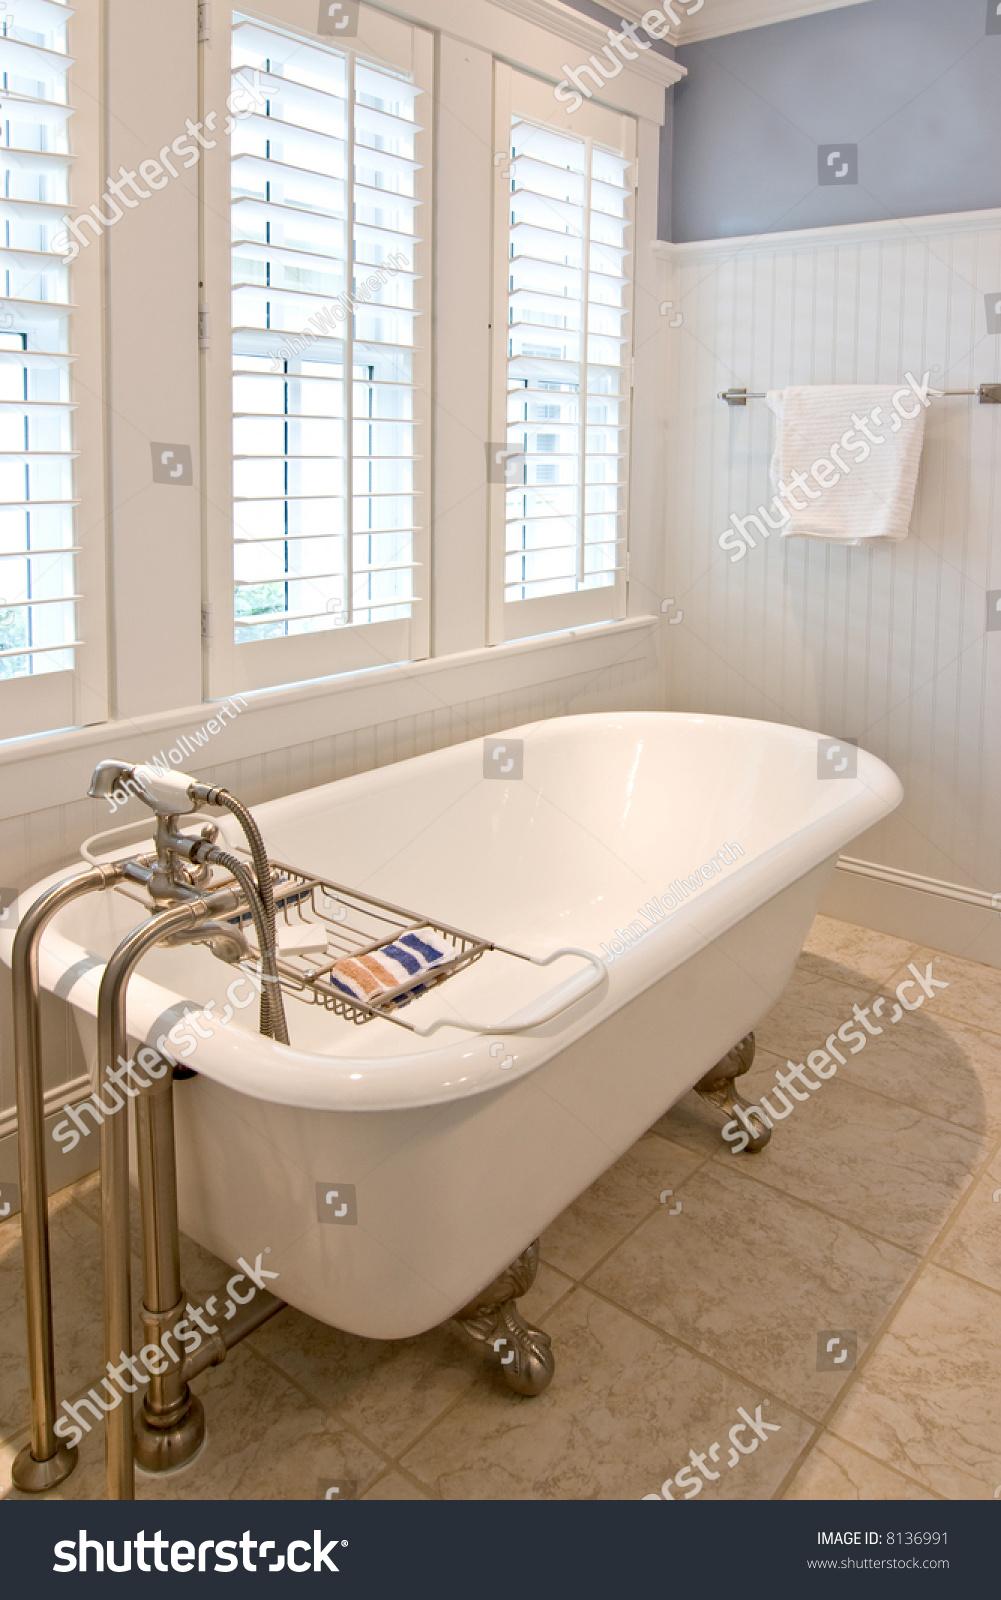 Classical Modern Bathroom With Clawfoot Tub Stock Photo